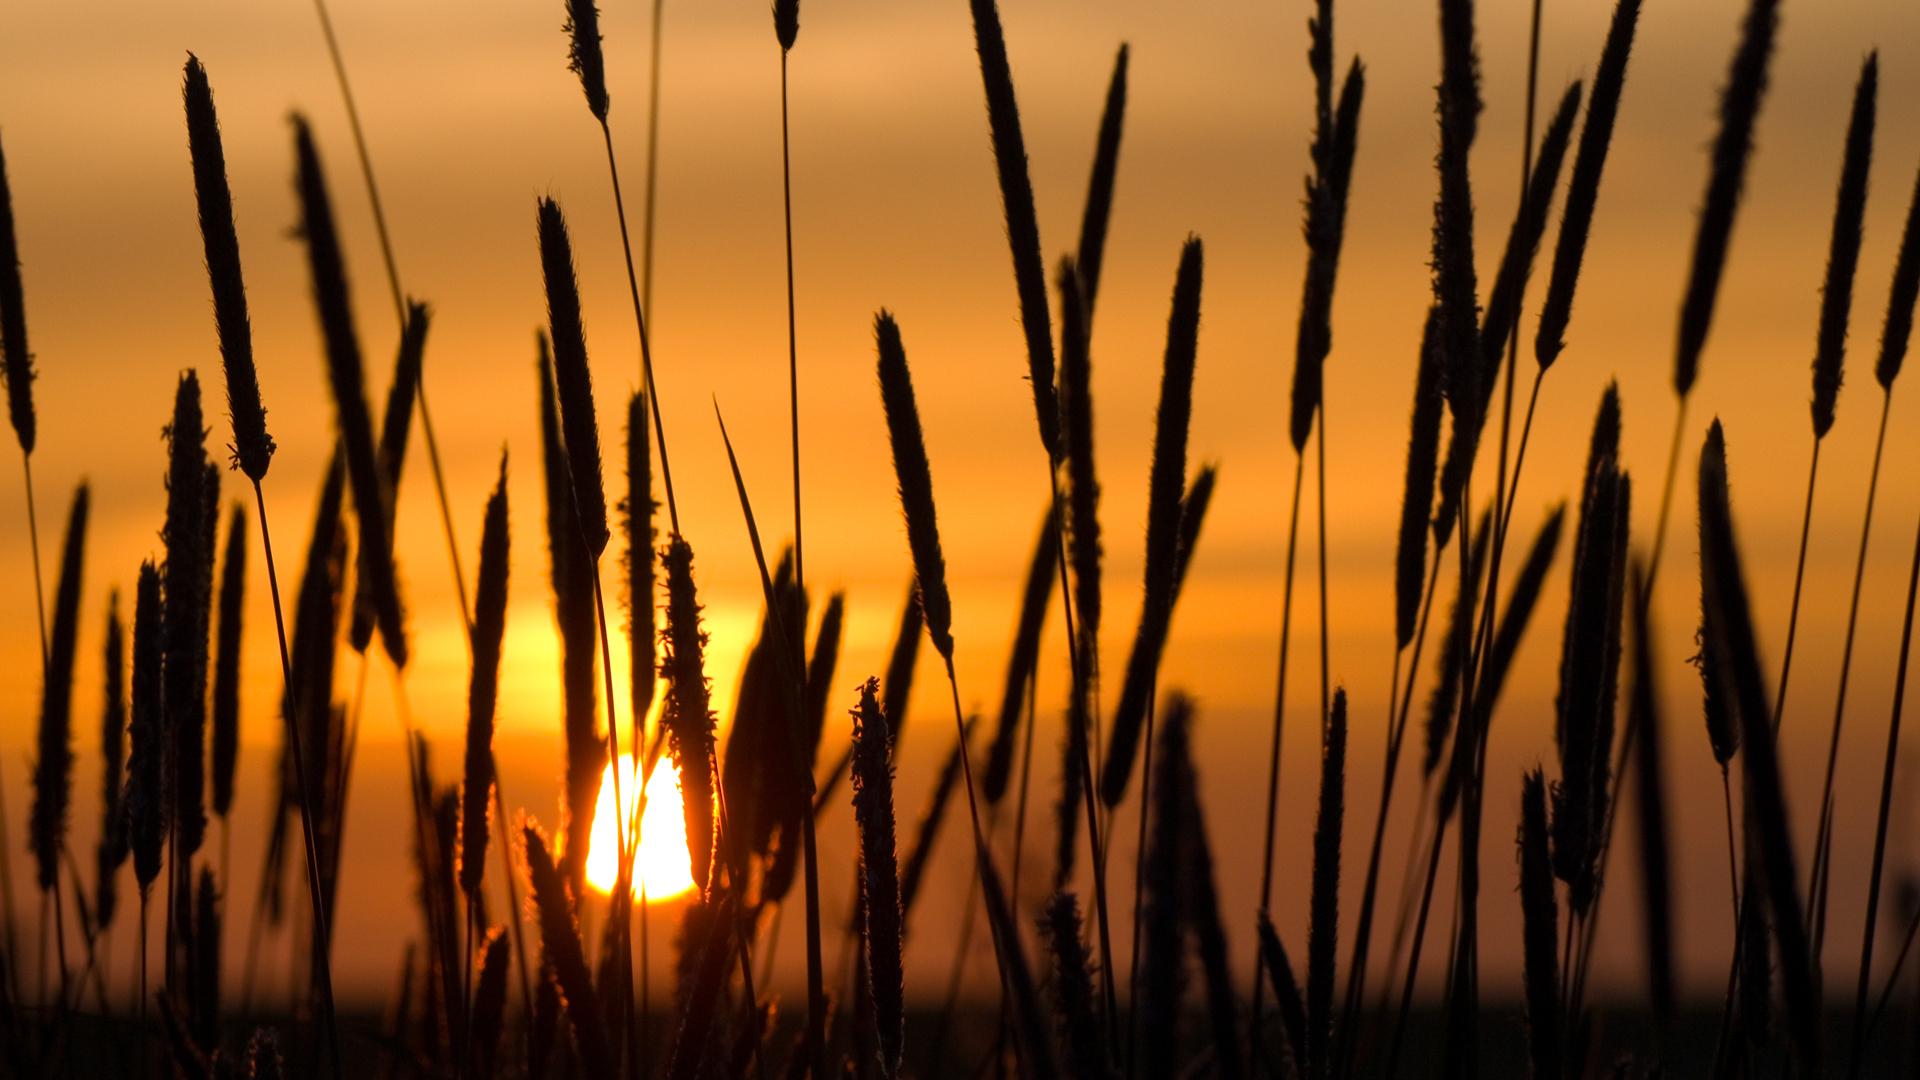 Earth - Sunset  Wheat Wallpaper